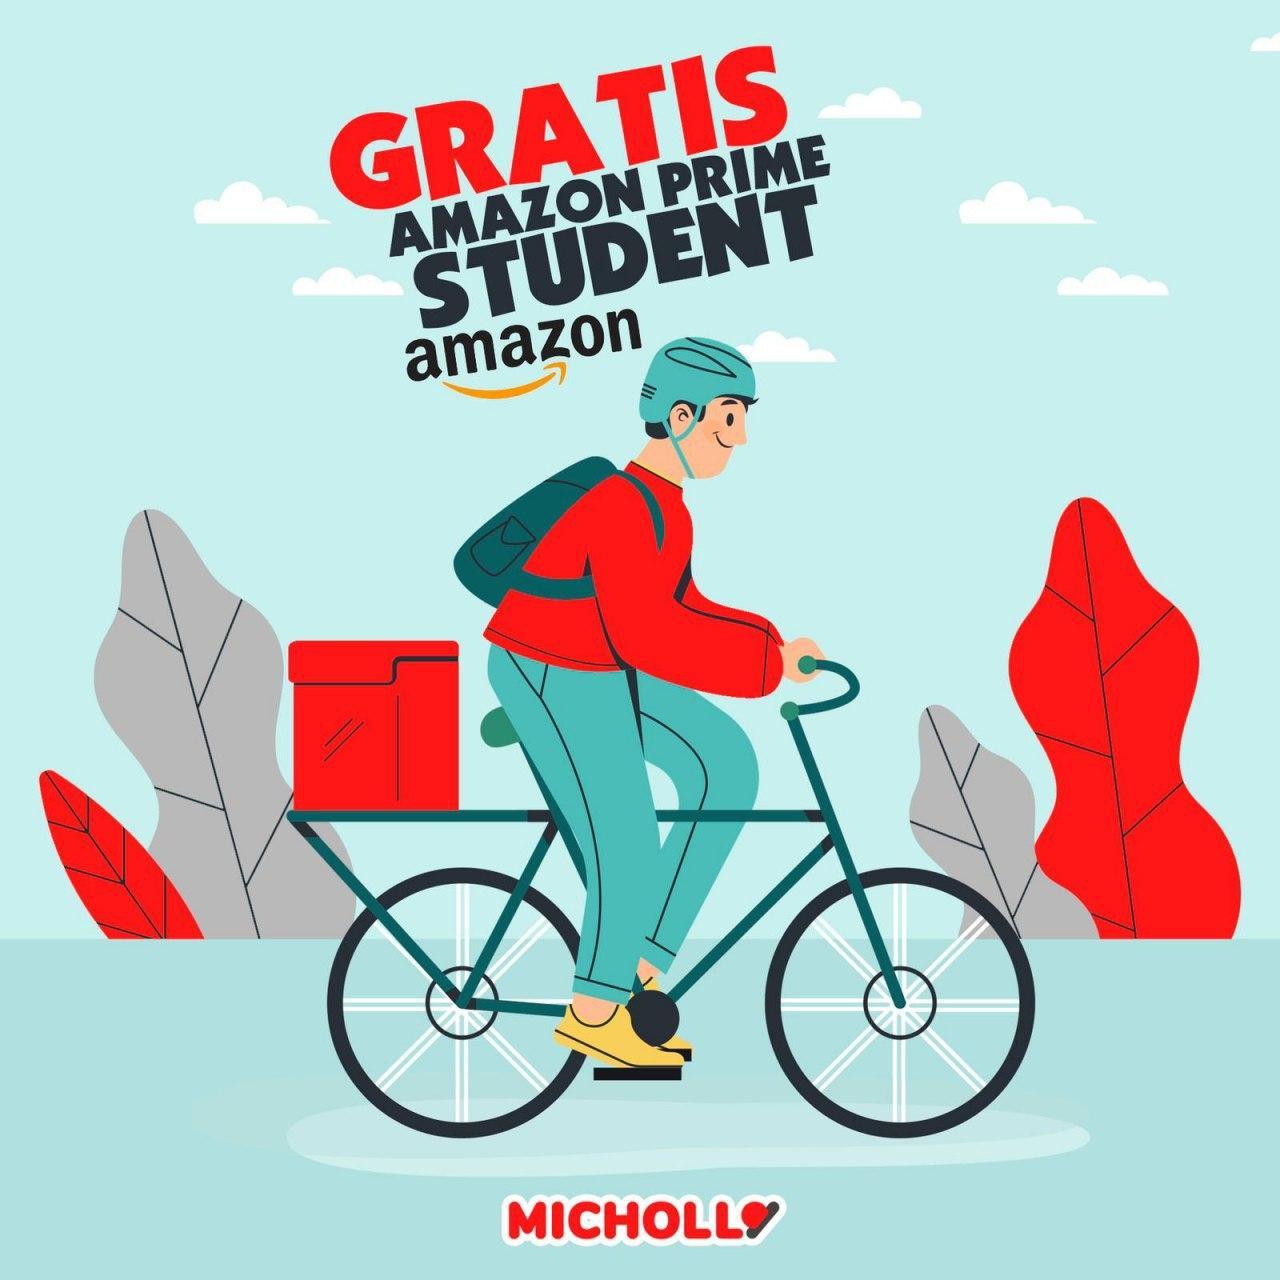 10€ gratis en Amazon Prime Student